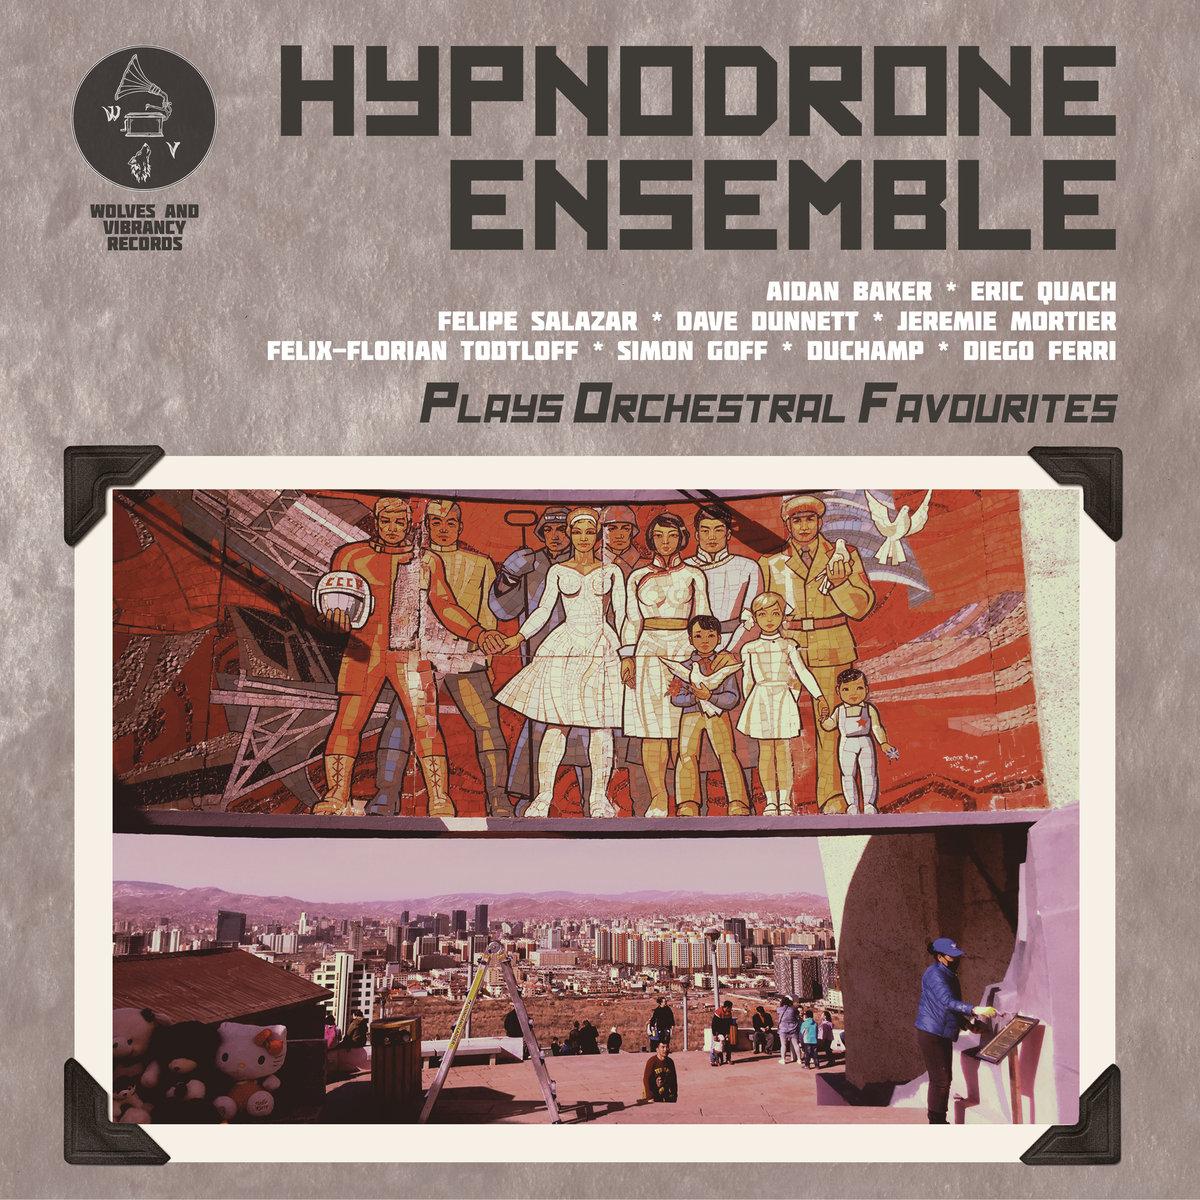 hypnodrone ensemble plays orchestral favorites